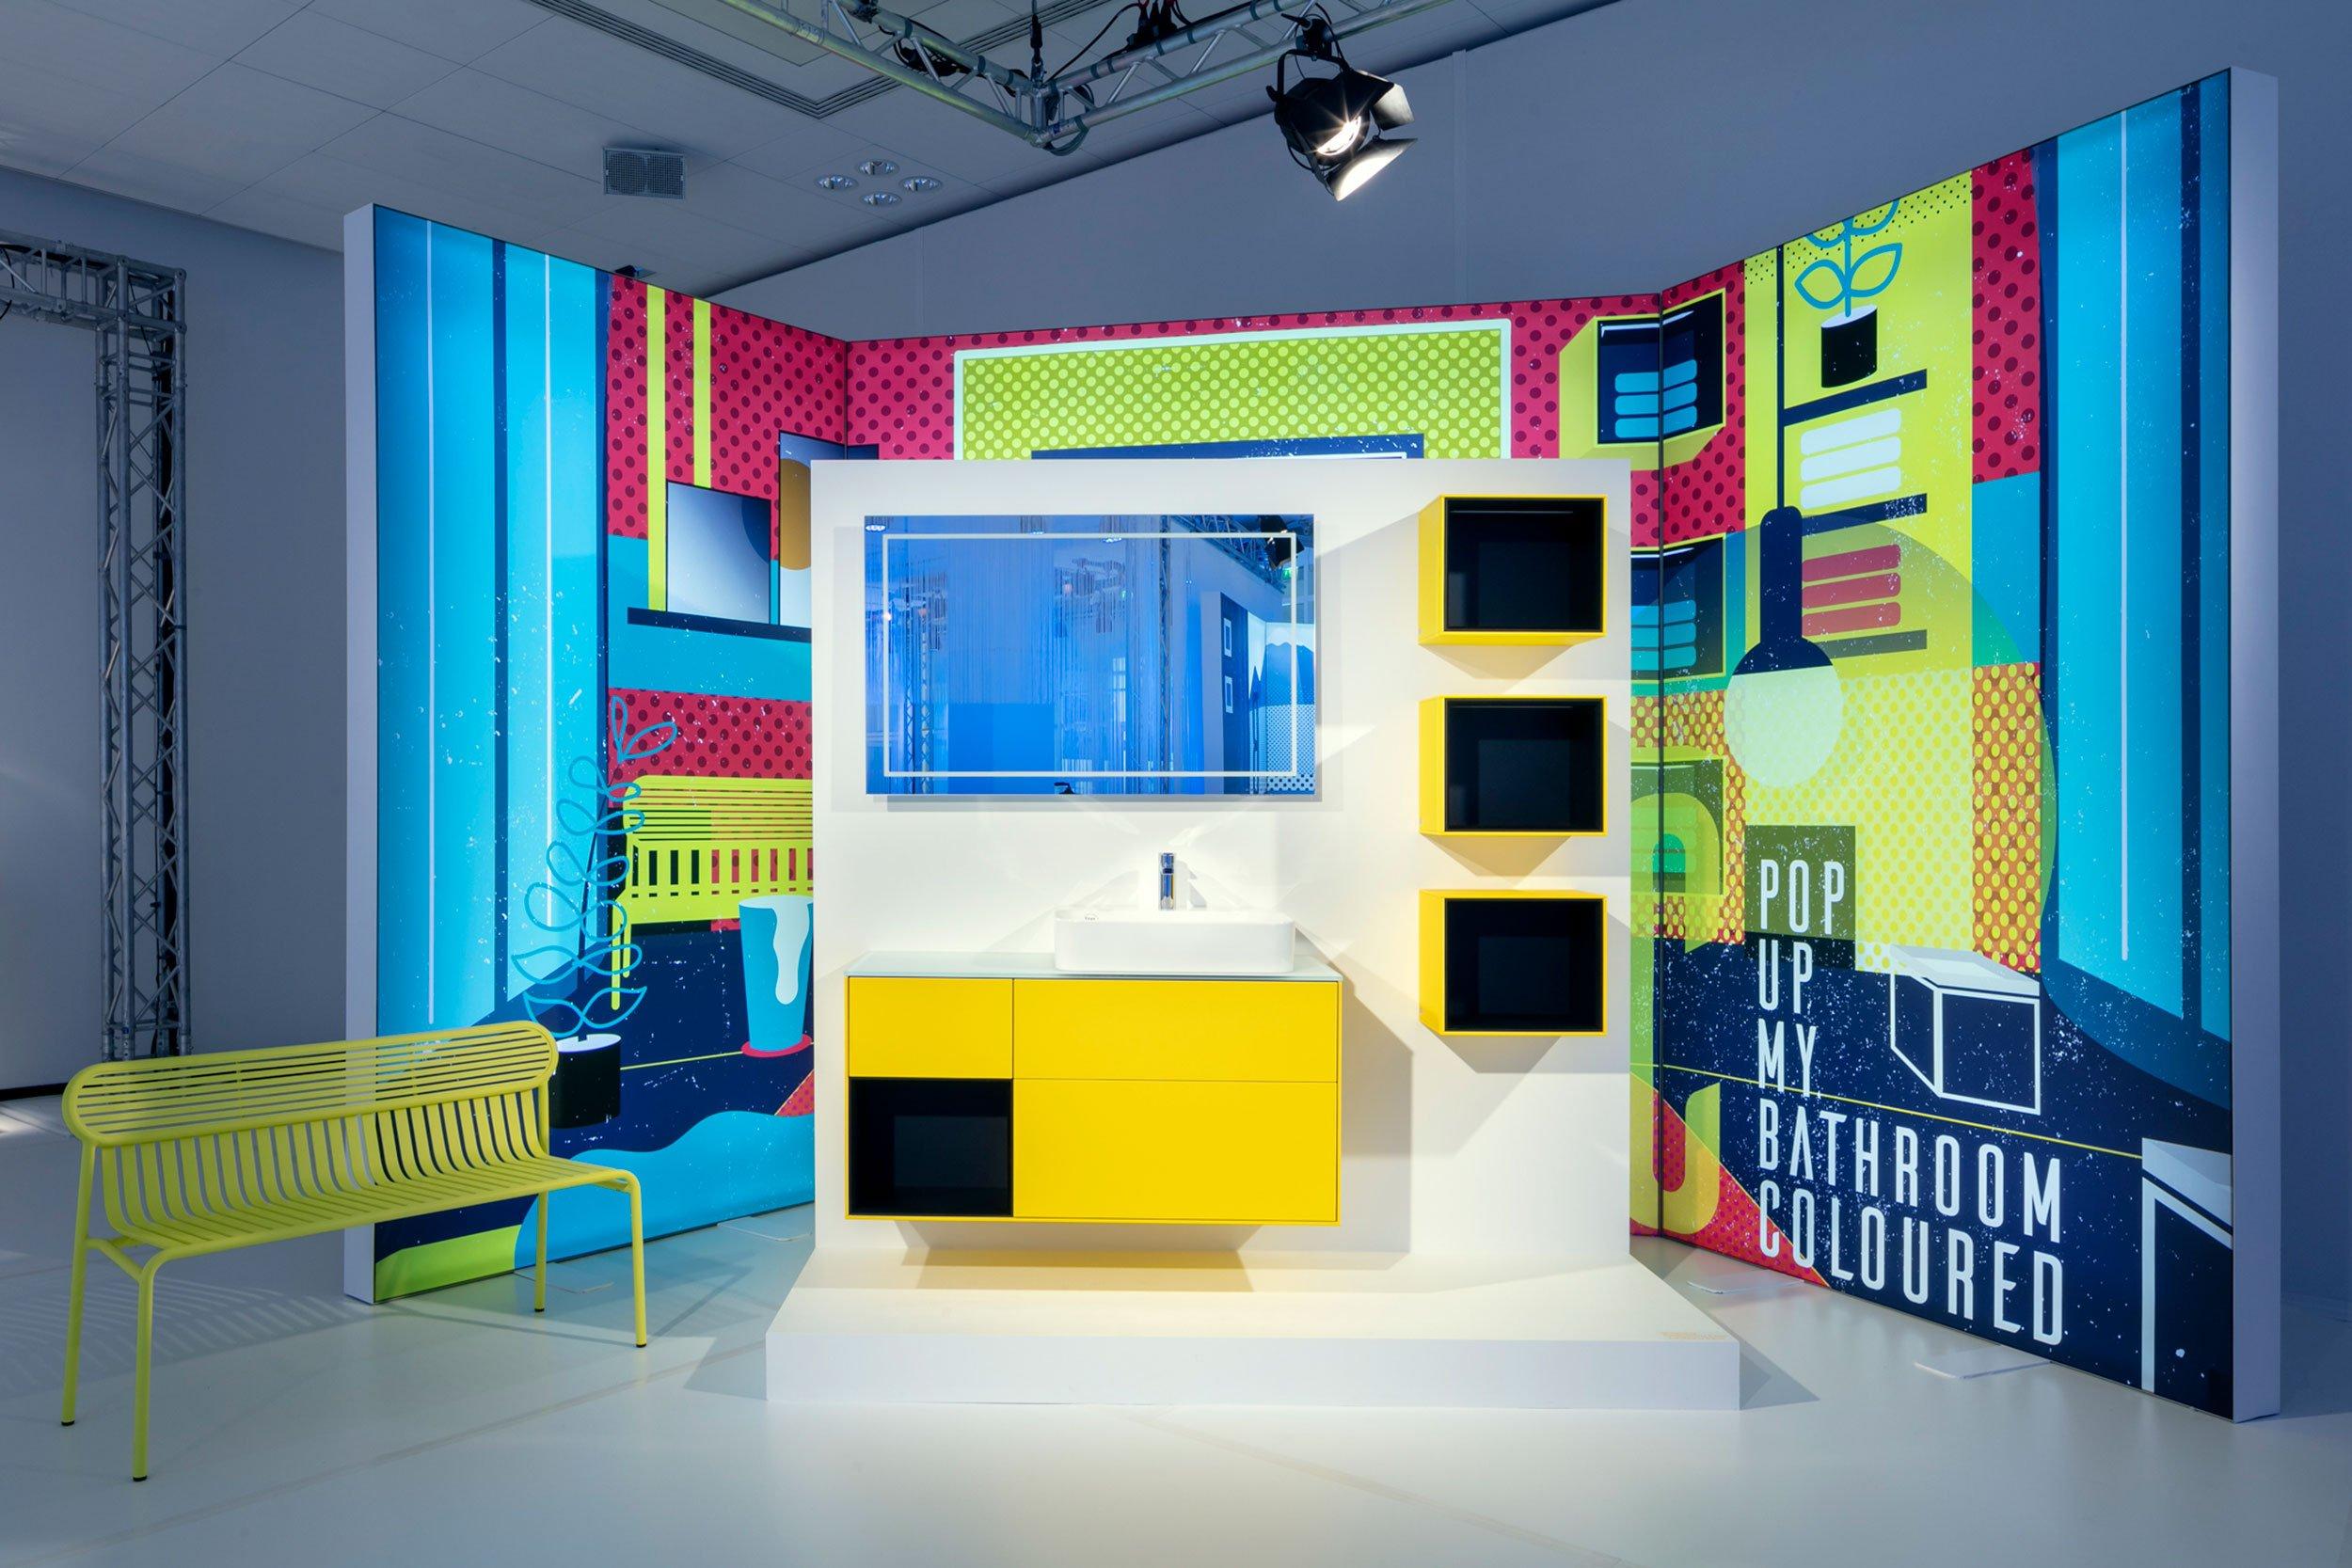 https://farconsulting.de/wp-content/uploads/2020/03/04_Pop-up-my-Bathroom_Ausstellung_ISH-2019.jpg